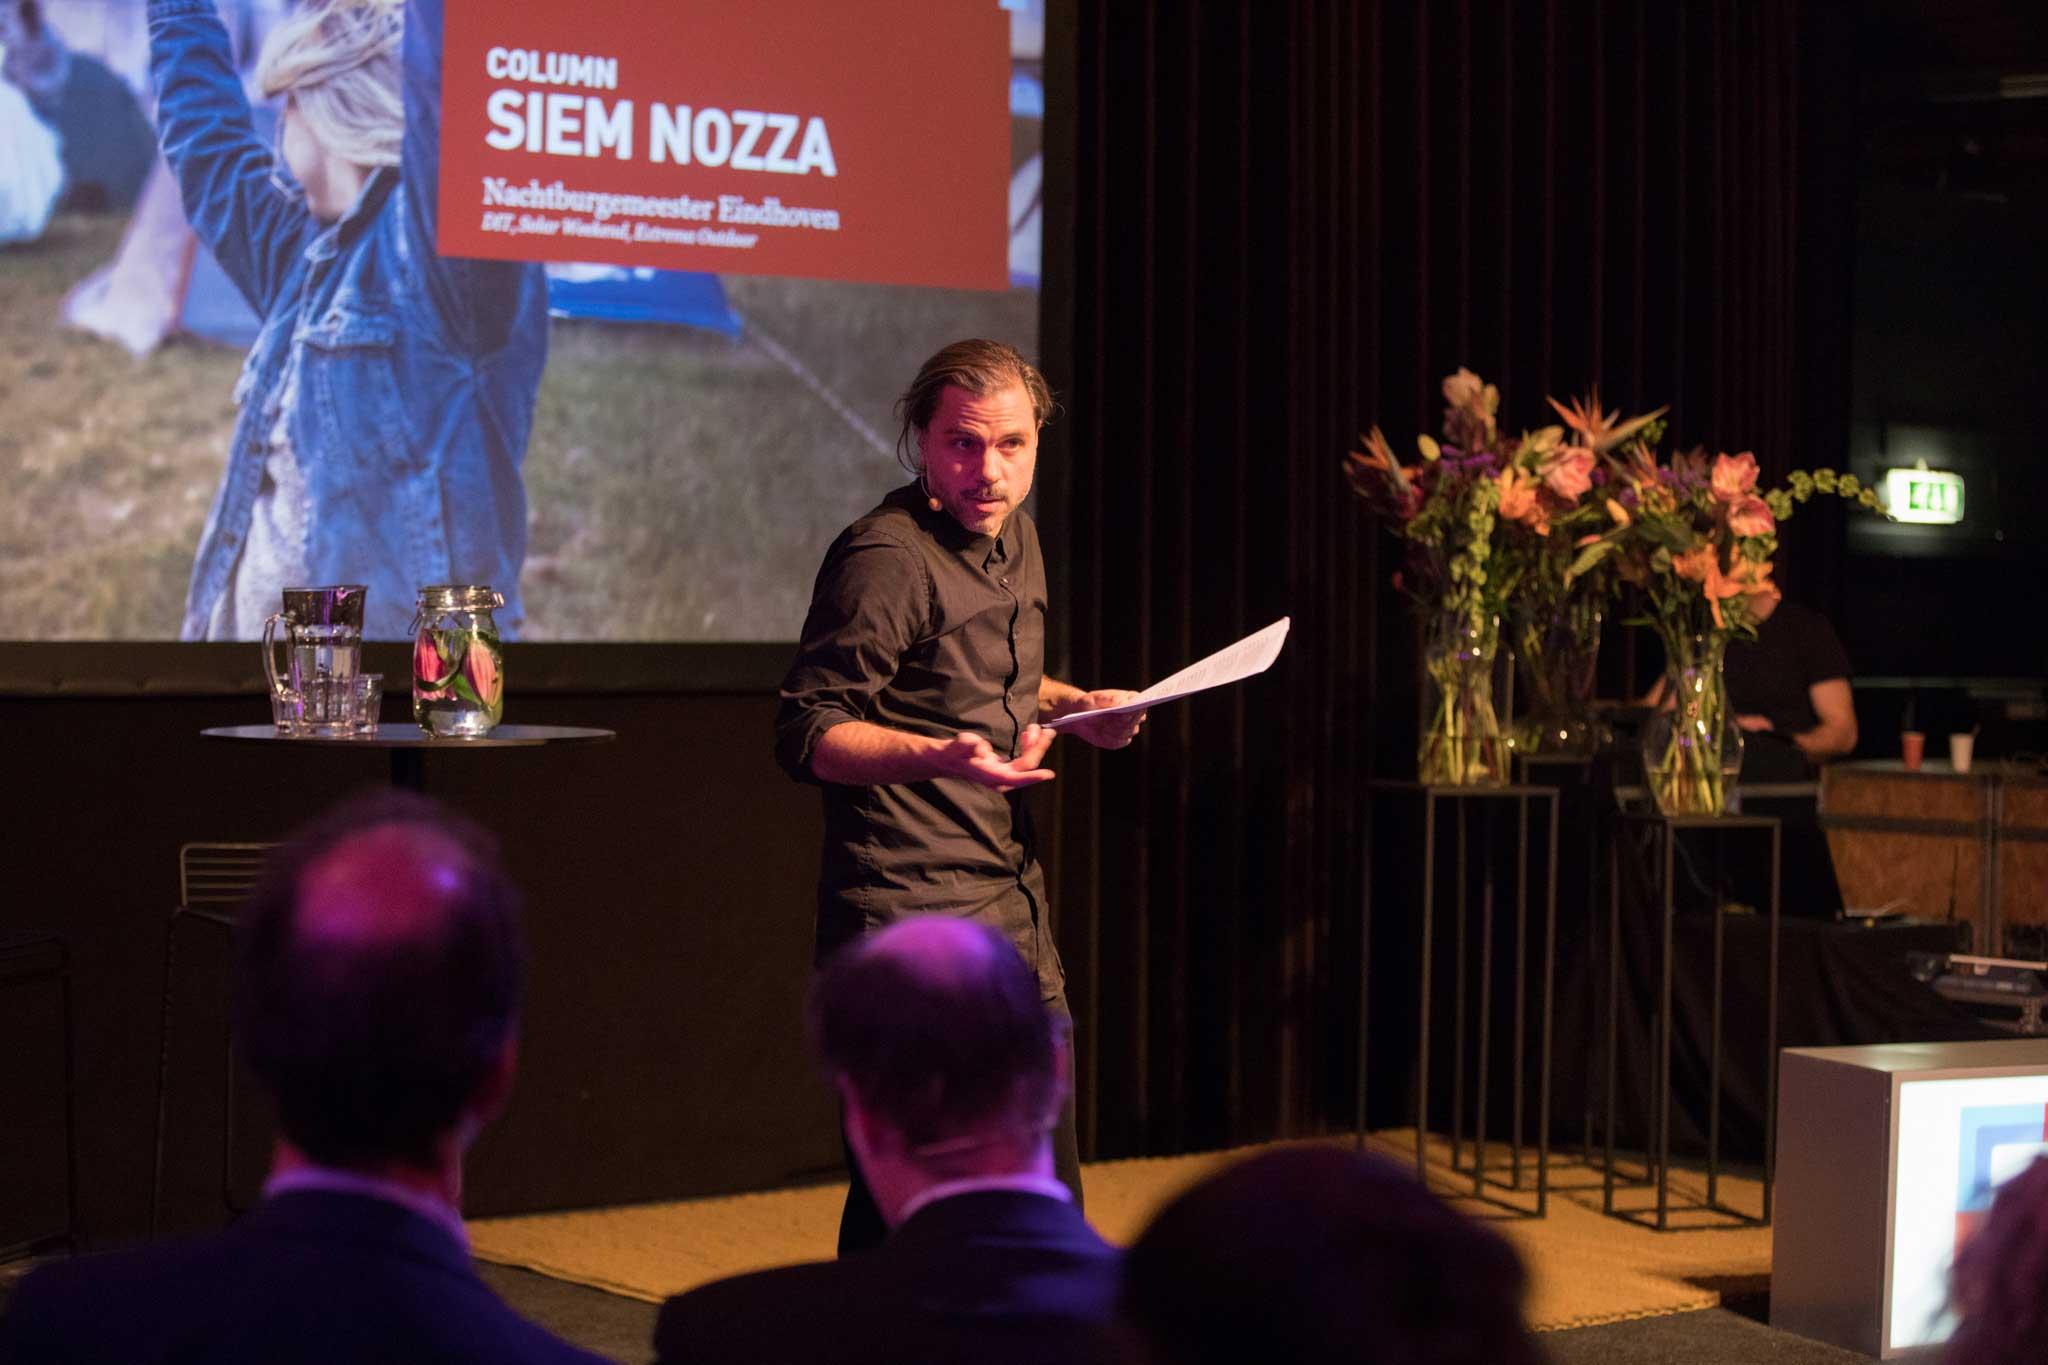 FunX: Siem Nozza over festivalisering